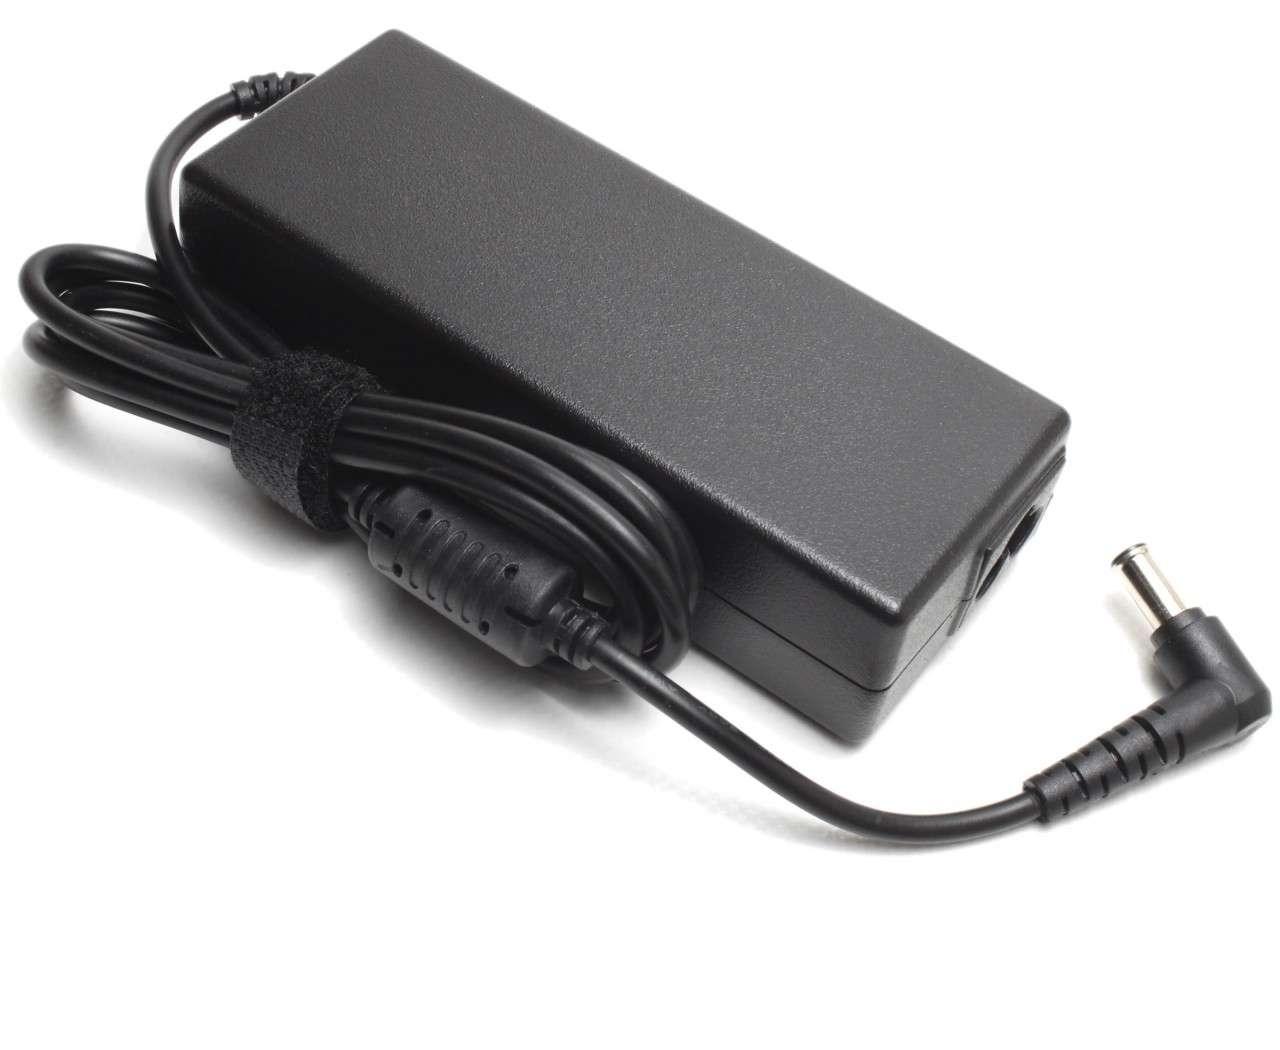 Incarcator Sony Vaio VGN S350 Replacement imagine powerlaptop.ro 2021